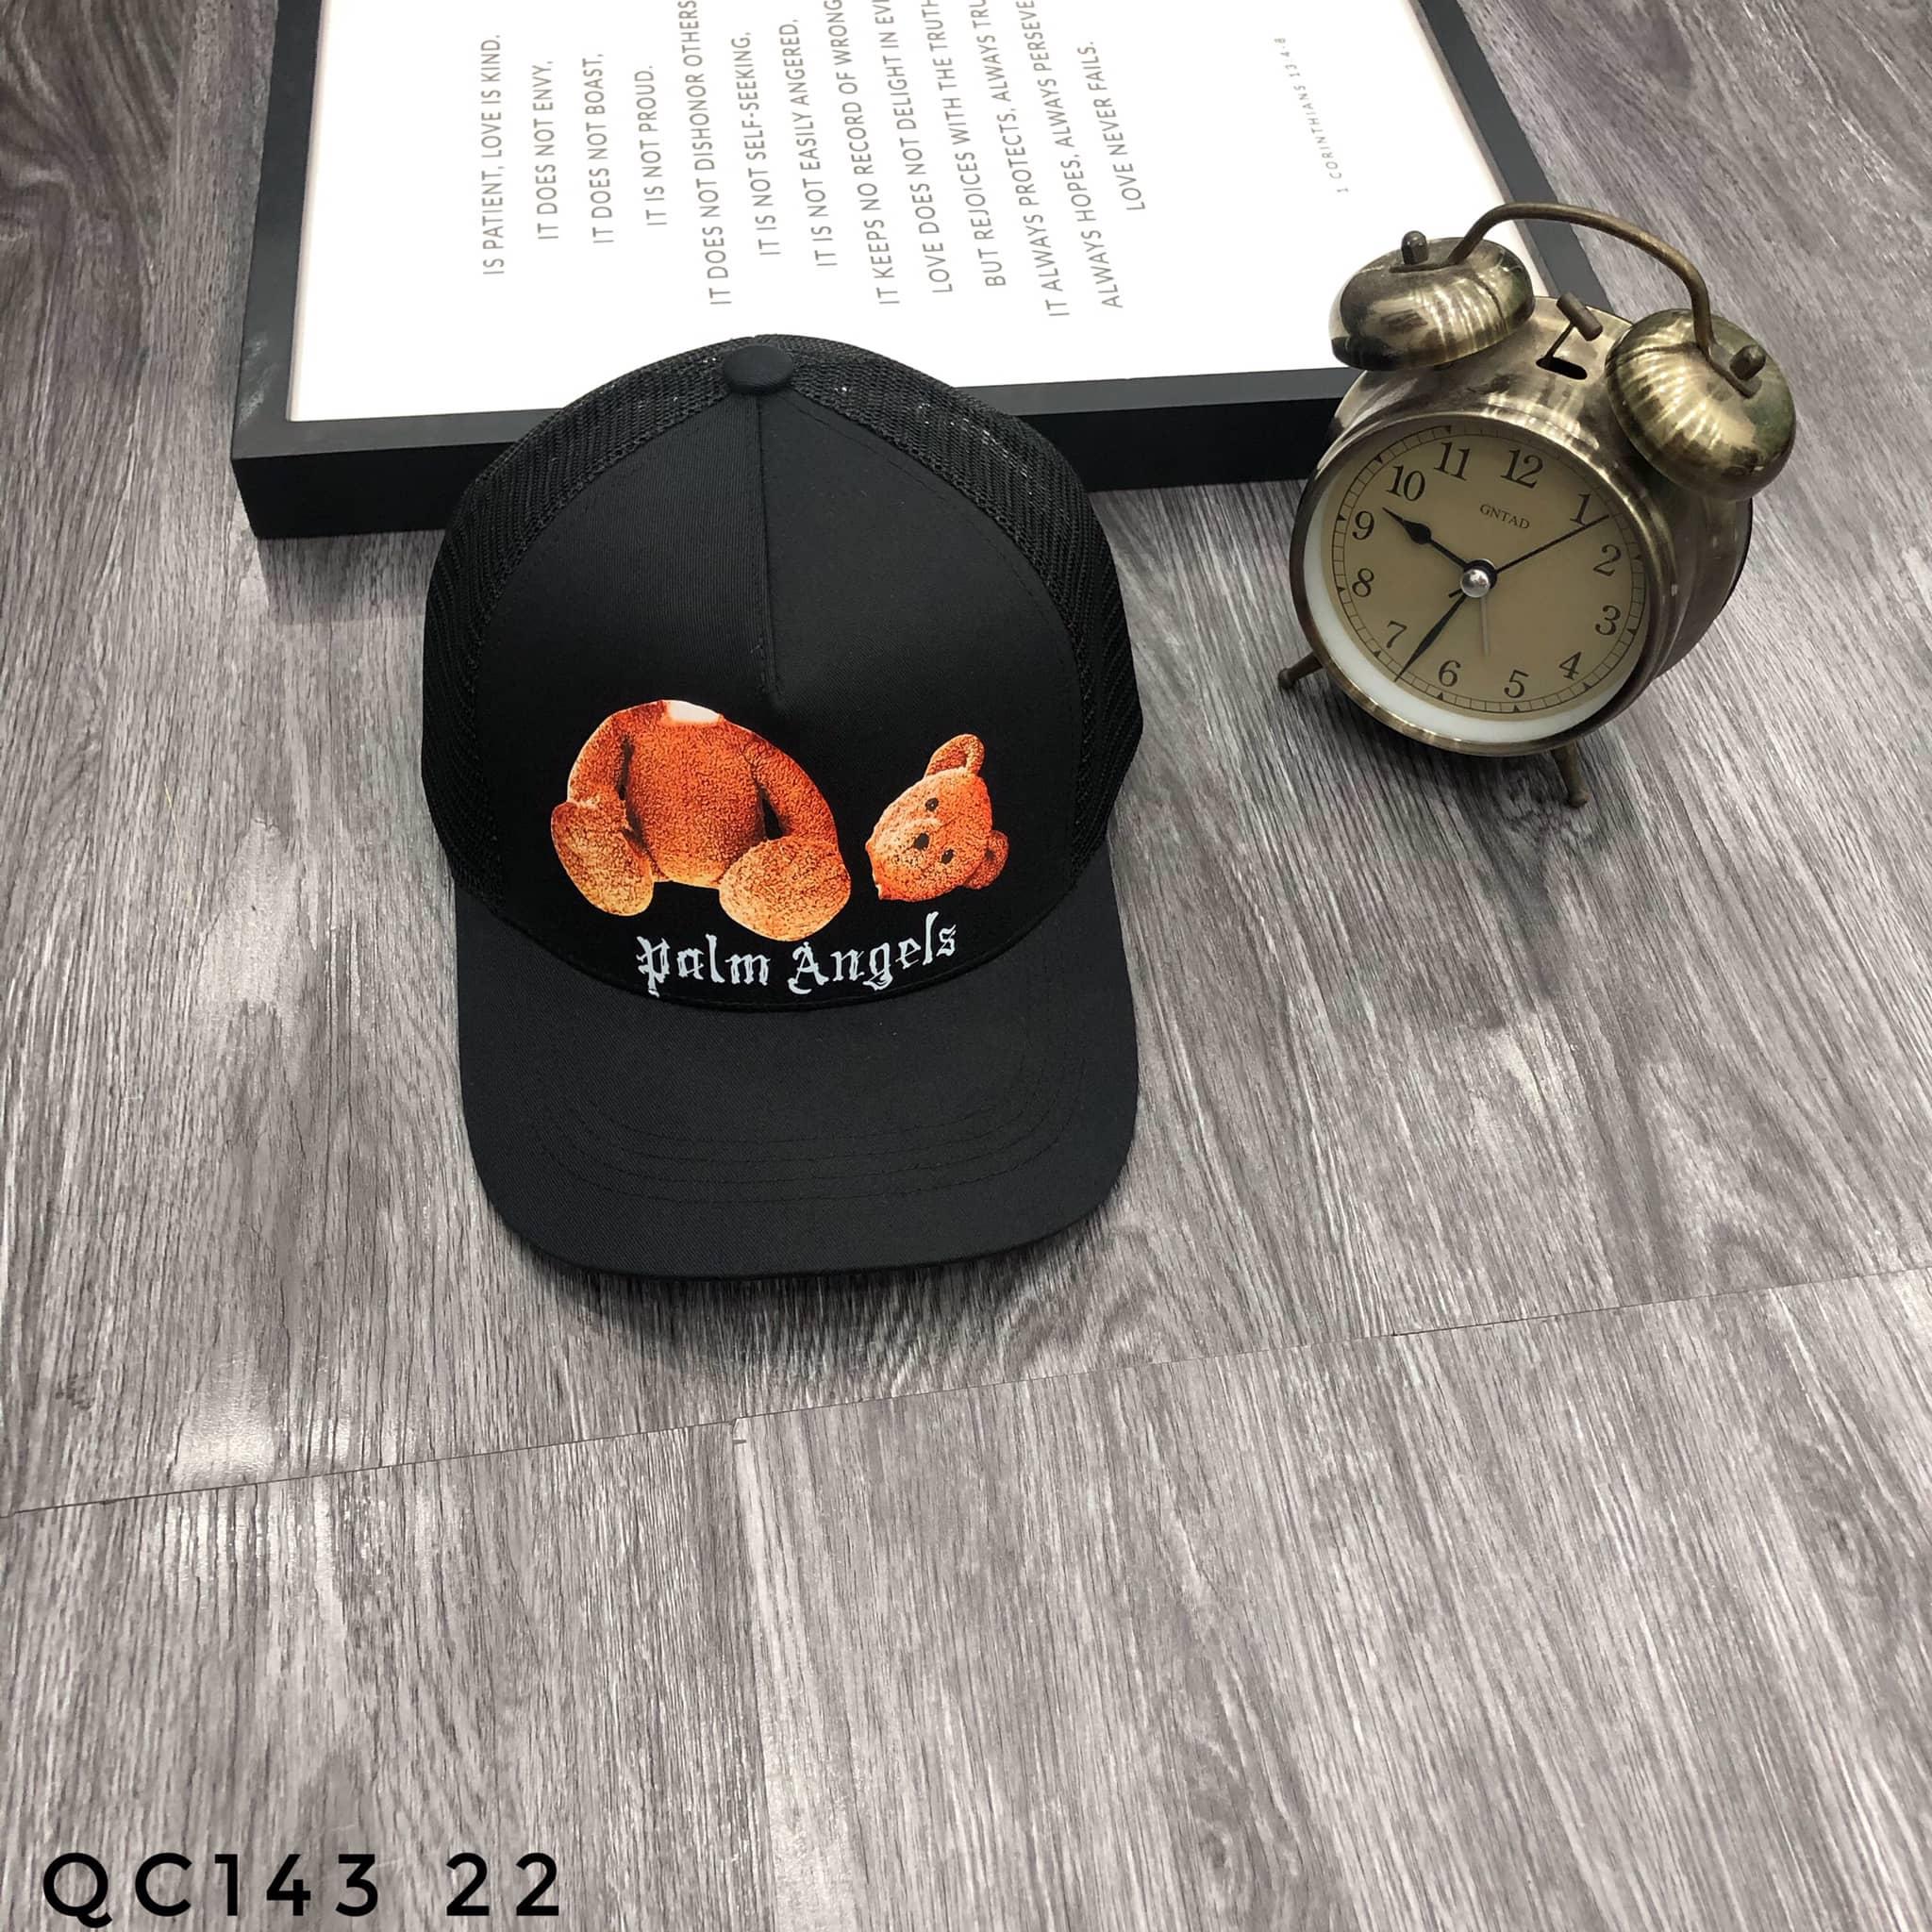 NÓN QC143